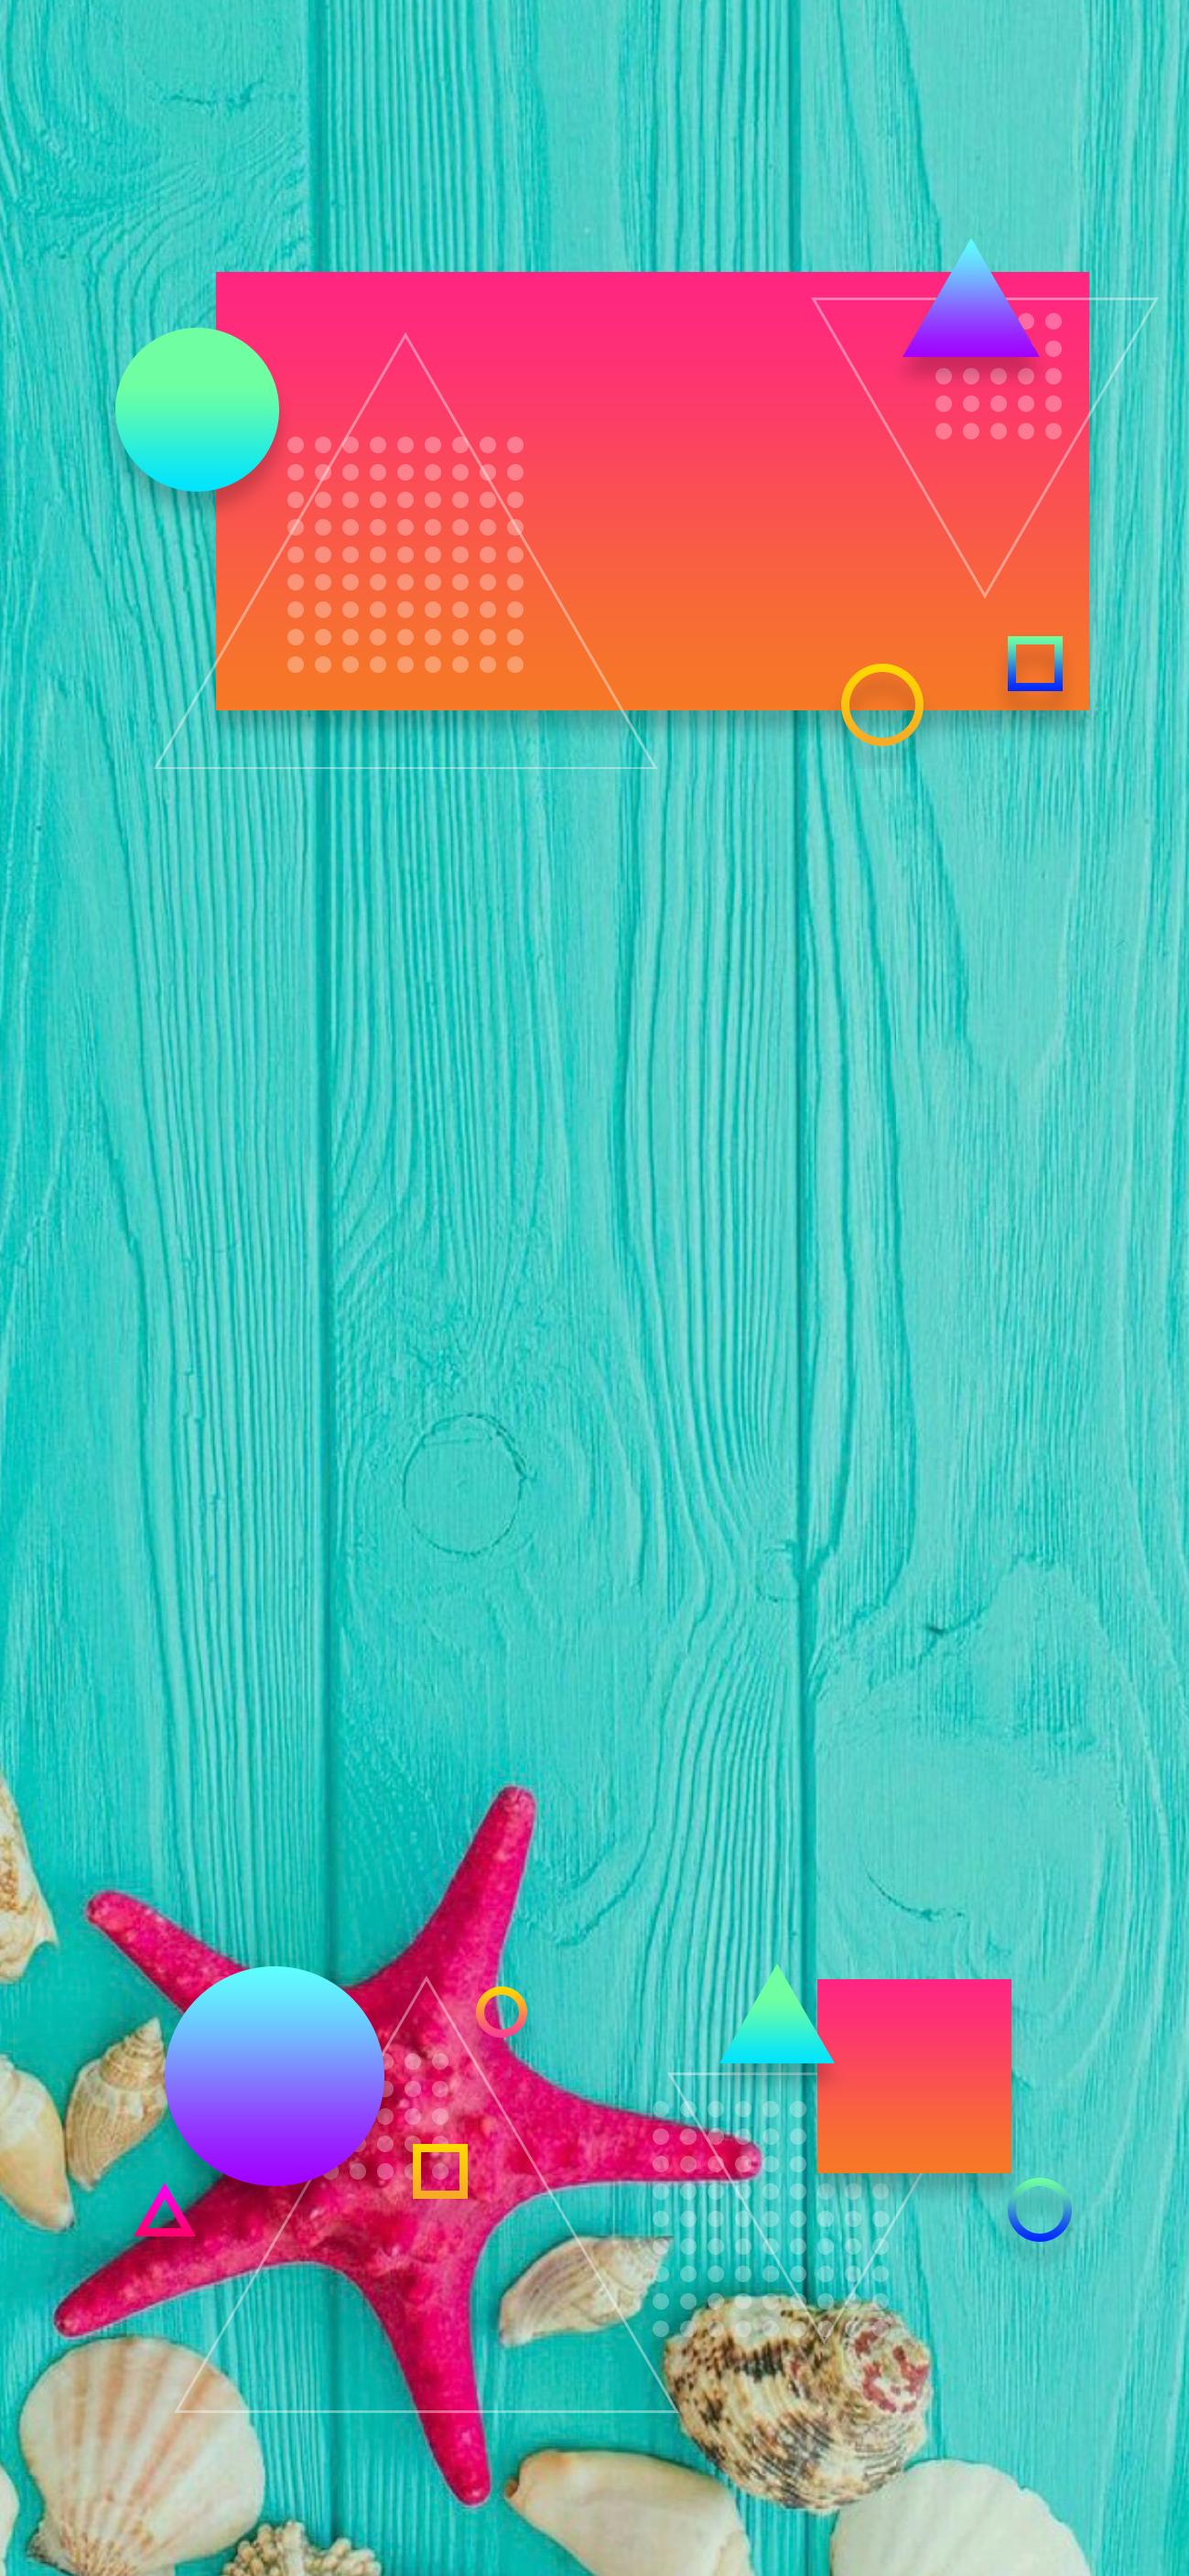 wallpaper iphone x Iphone wallpaper, Iphone, Wallpaper